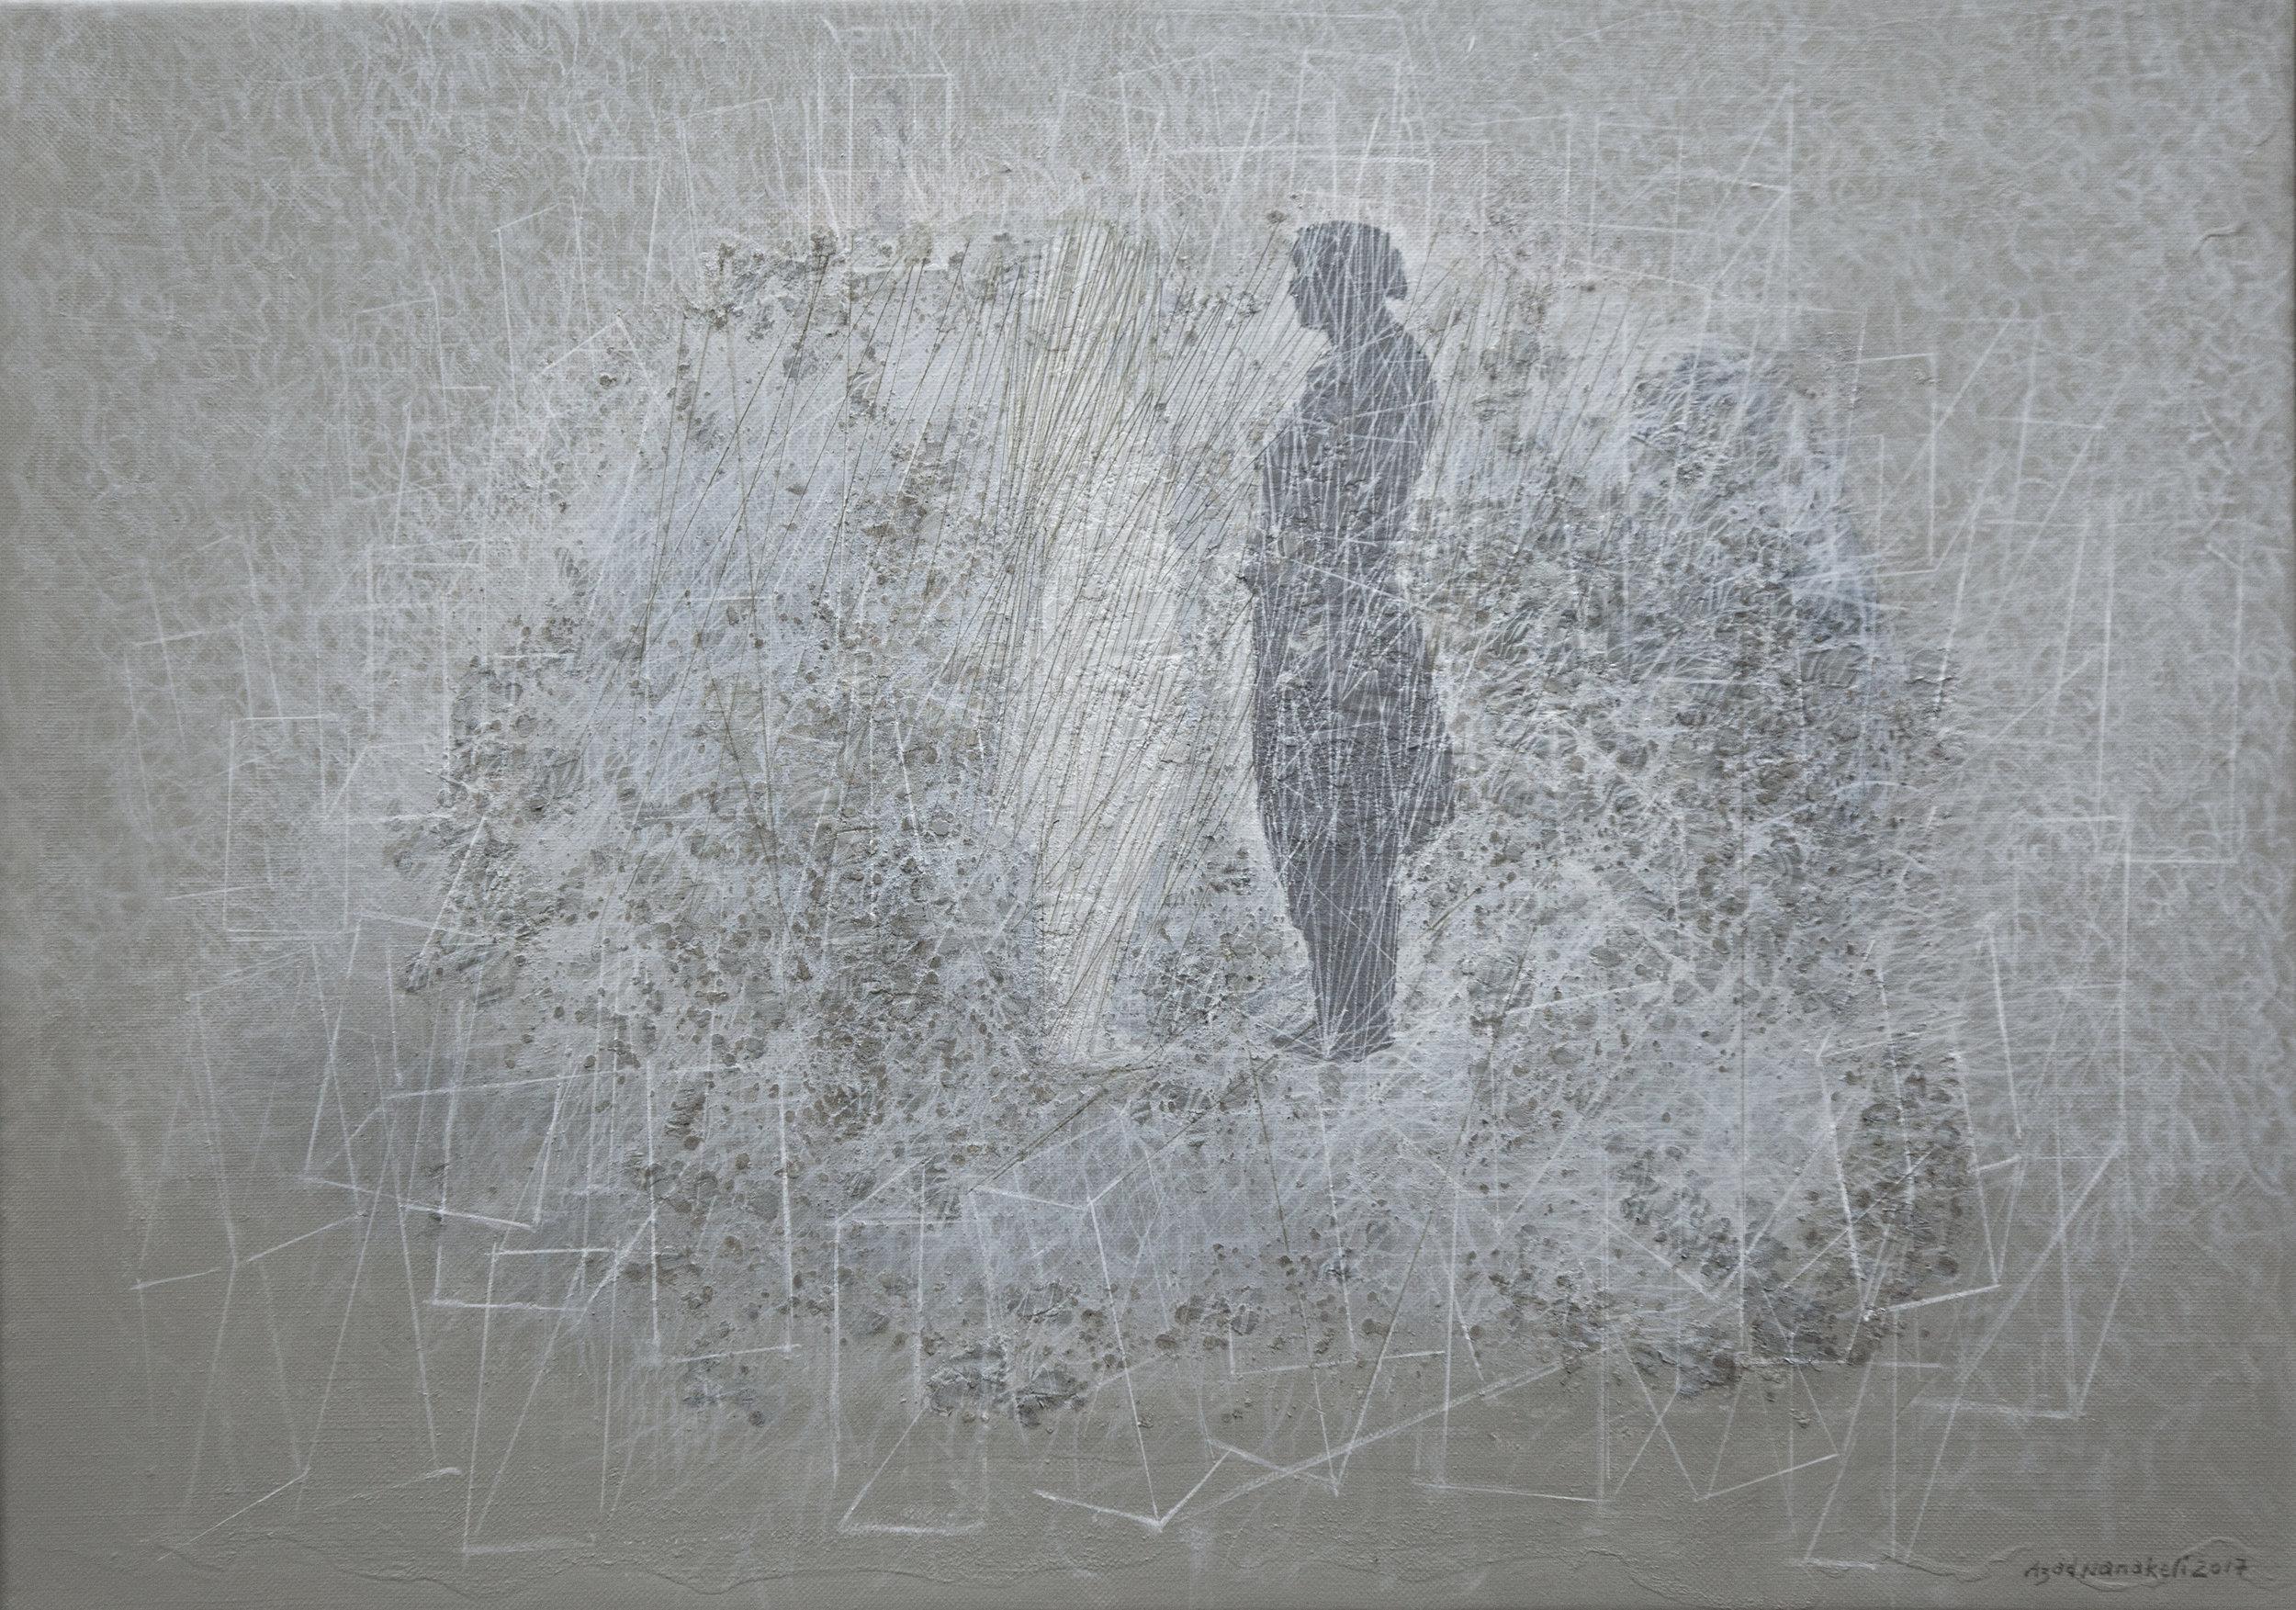 Azad Nanakeli.  The Other World (9) , 2017. Mixed media, acrylic on canvas 50 x 70 cm. Courtesy of the artist and XVA Gallery.